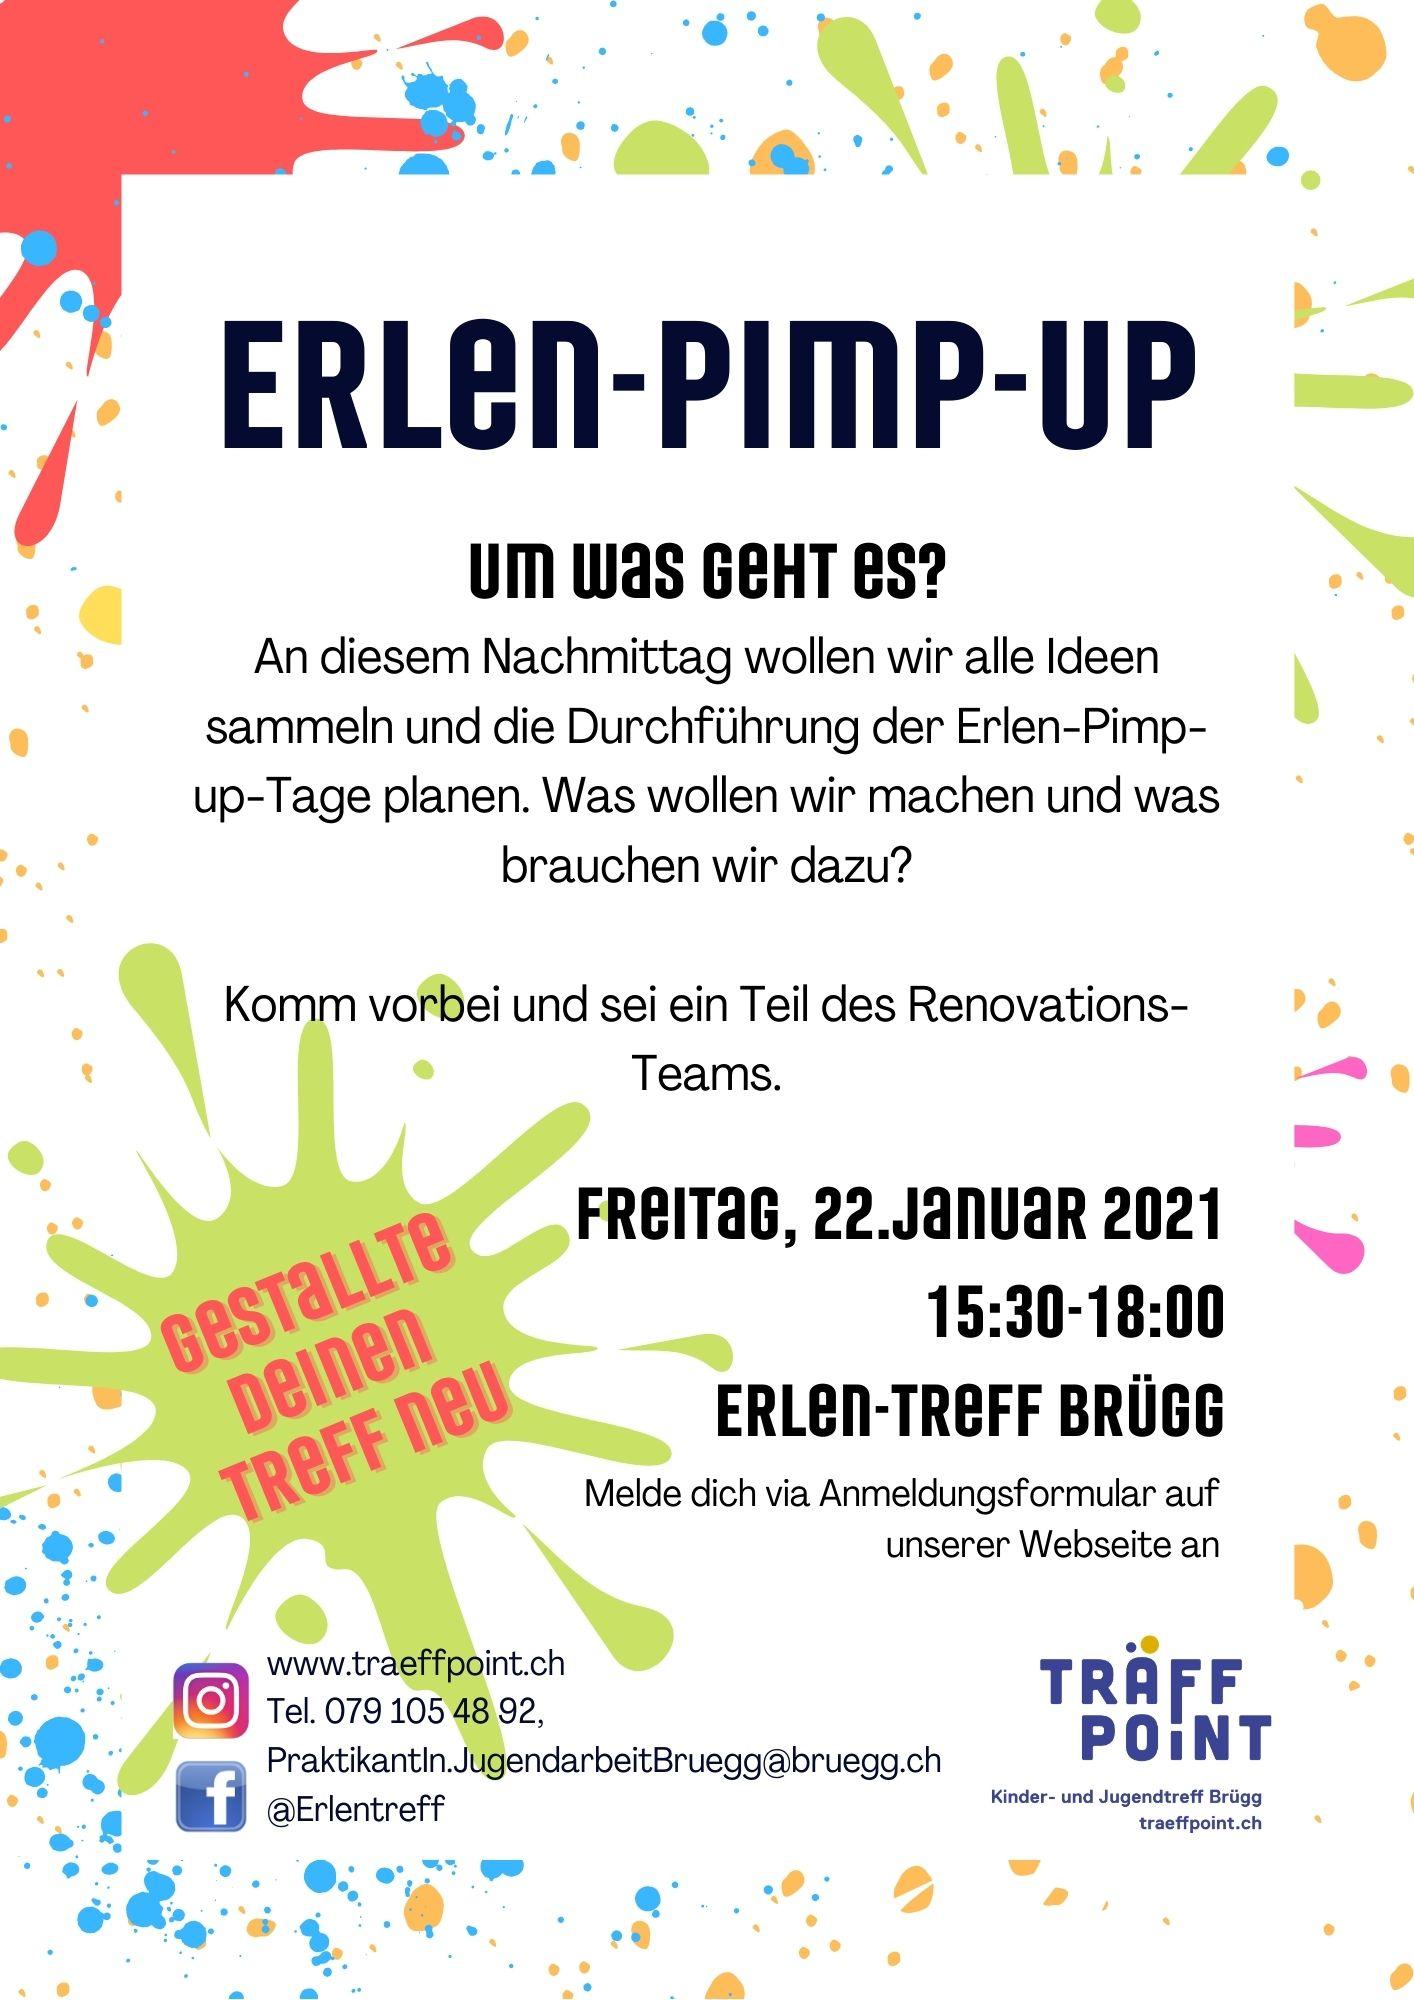 Erlen-Pimp-up-Kick-off